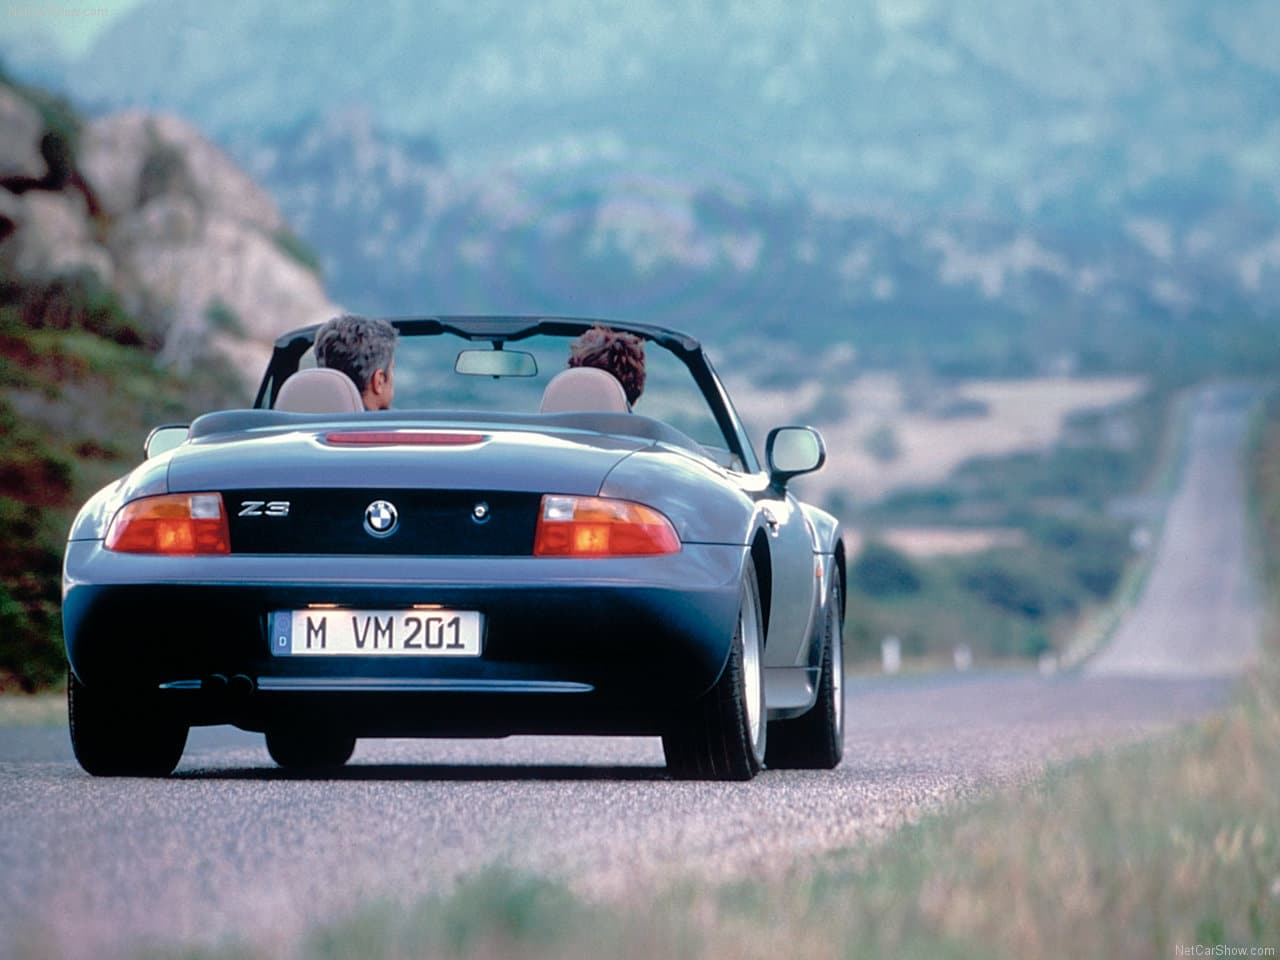 BMW Z3, BMW, Z3, roadster, two-seater, convertible, cabriolet, sports car, german car, classic car, retro car, appreciating classic, car, cars, automotive, motoring, ebay, ebay motors, autotrader, future classic, modified car, rear wheel-drive, car, cars